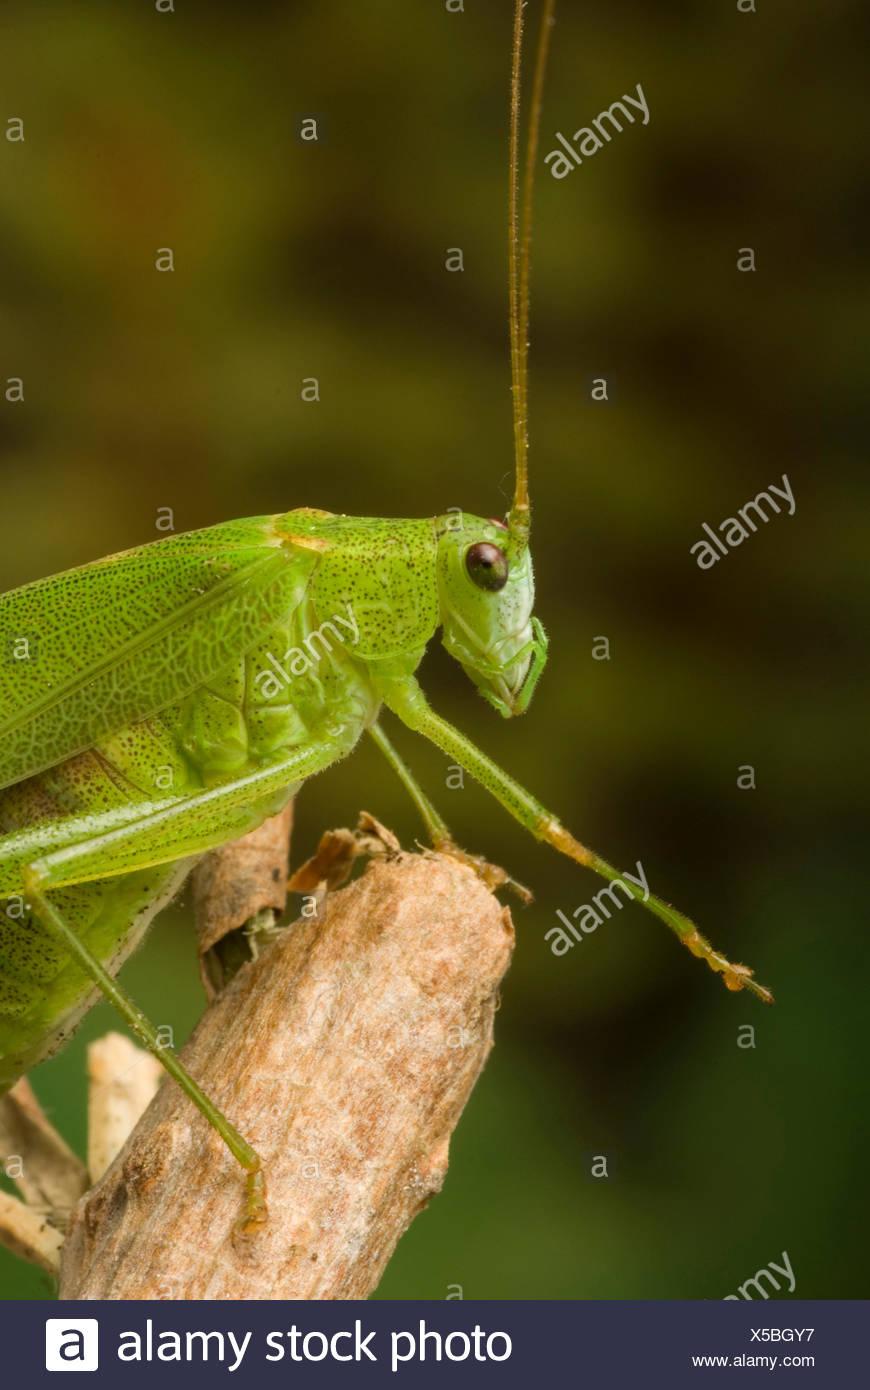 sickle-bearing bushcricket (Phaneroptera falcata), sitting on a twig, Germany - Stock Image